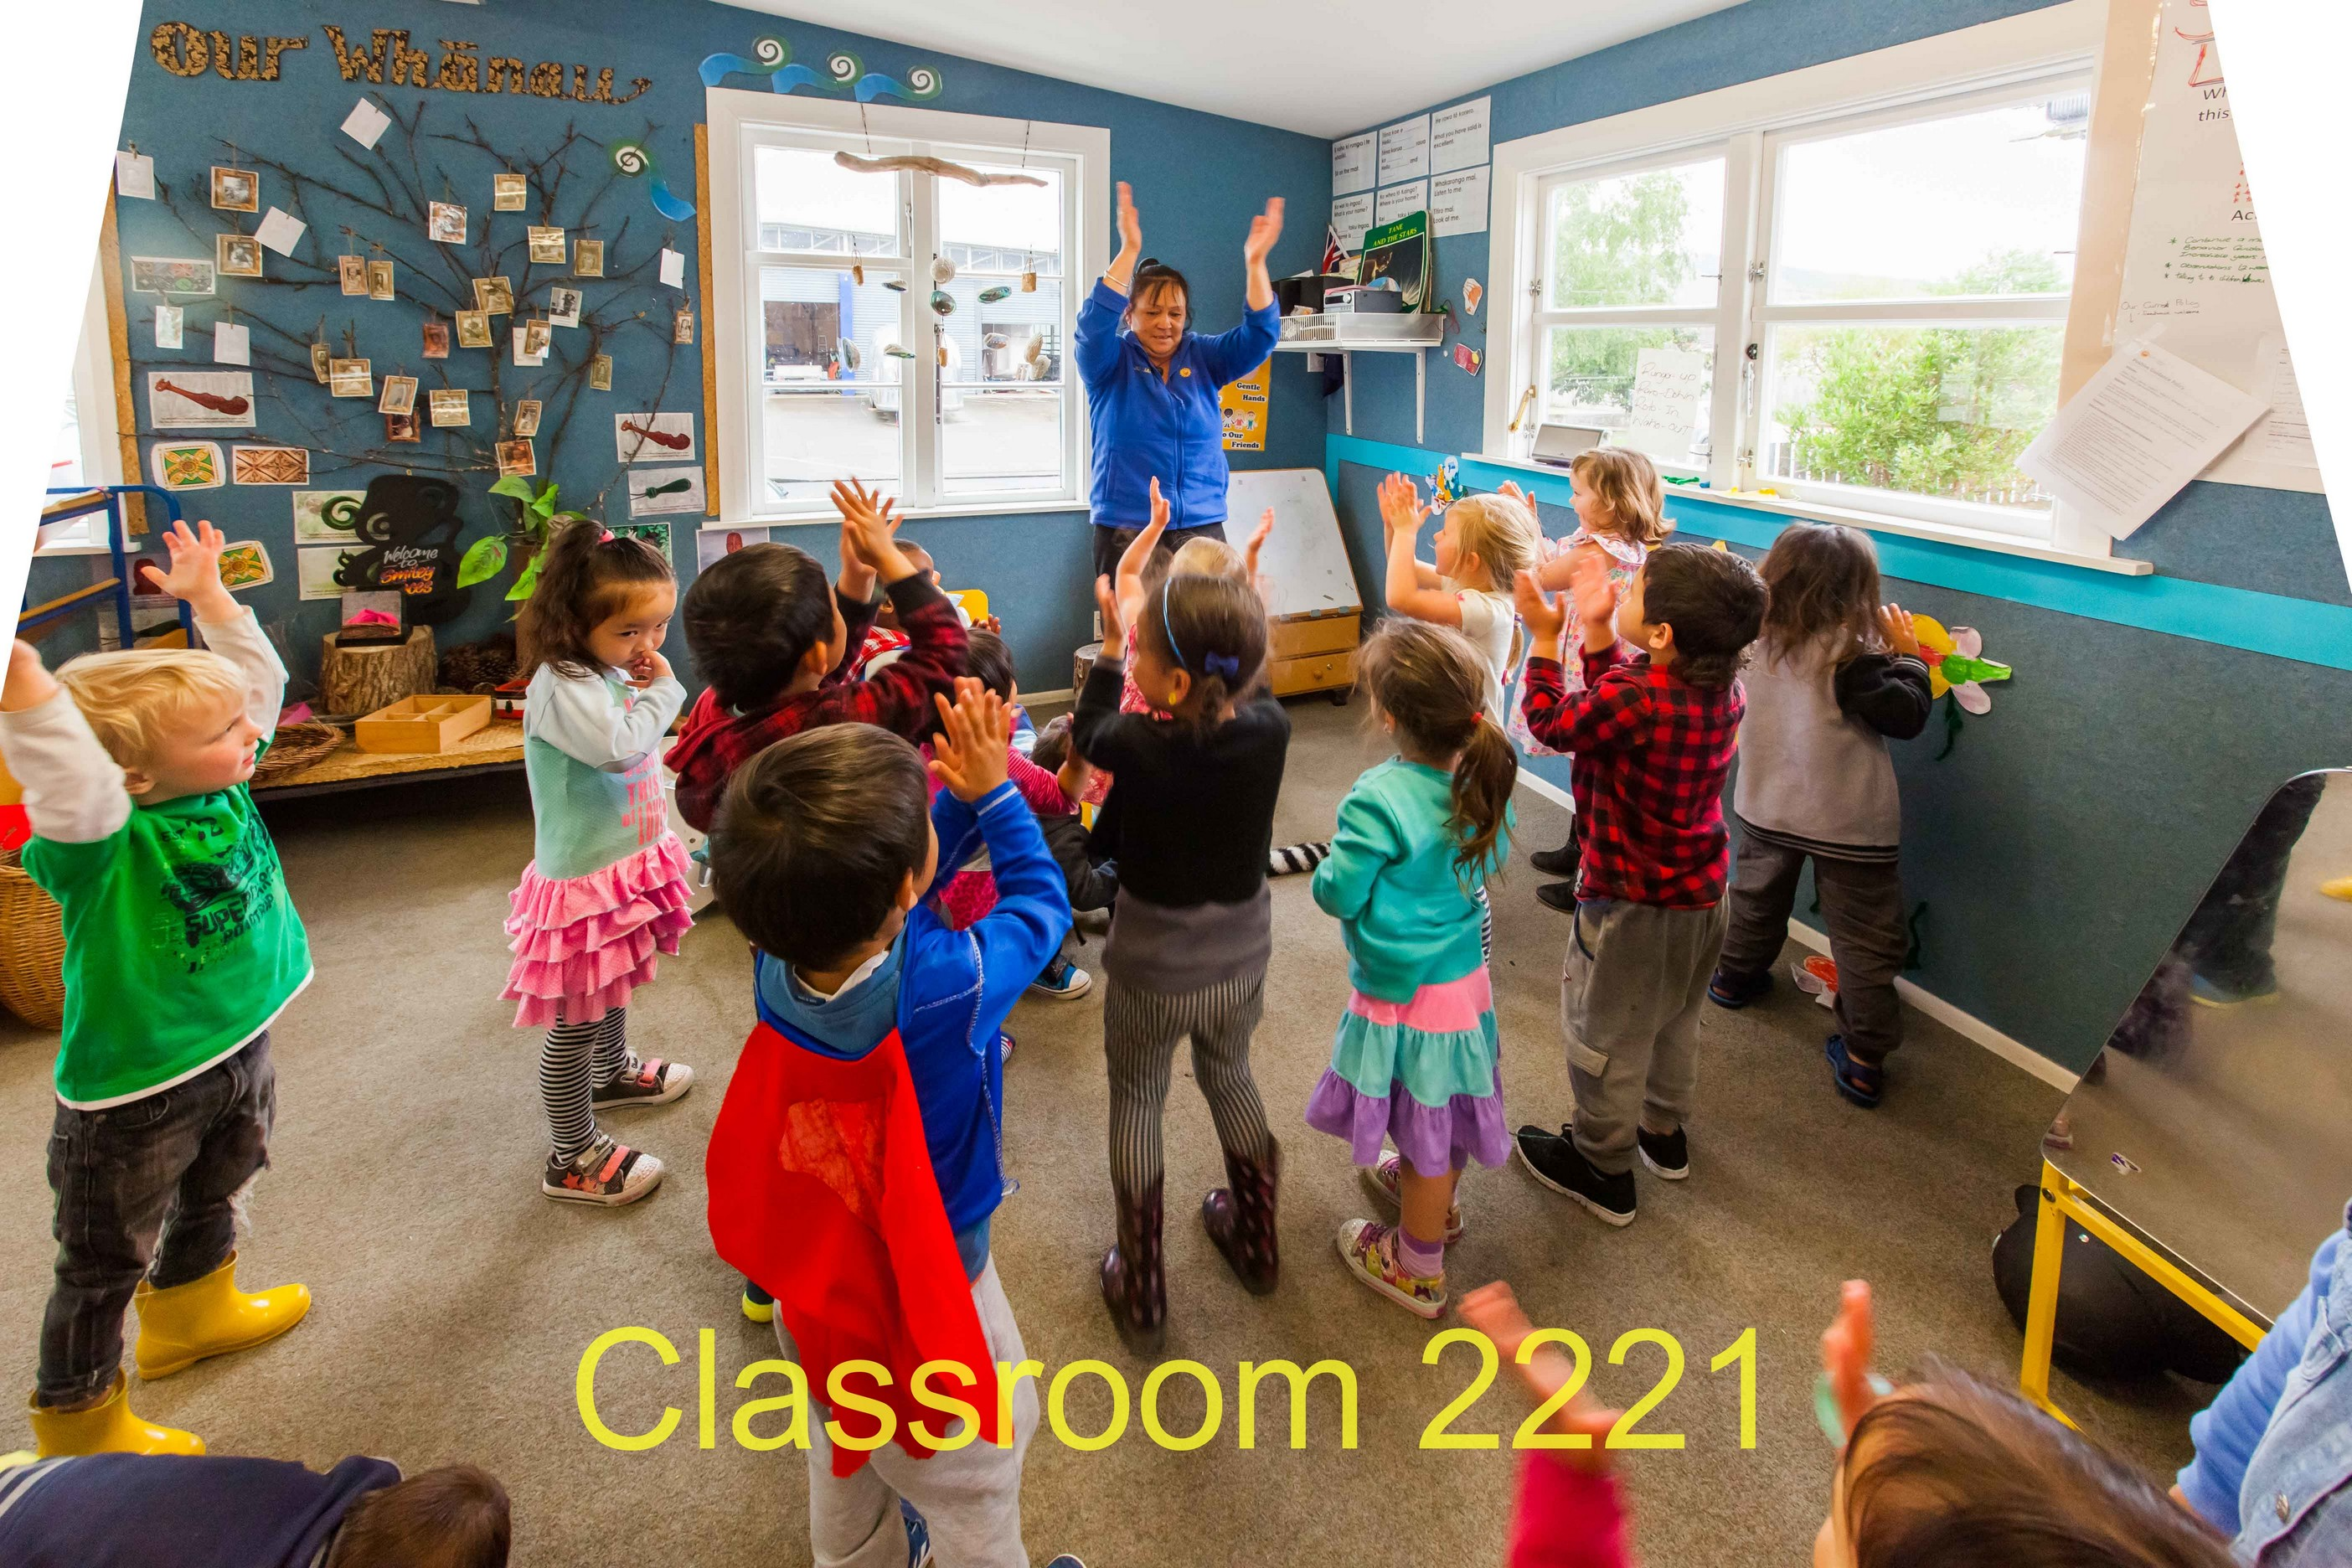 Classroom 2221